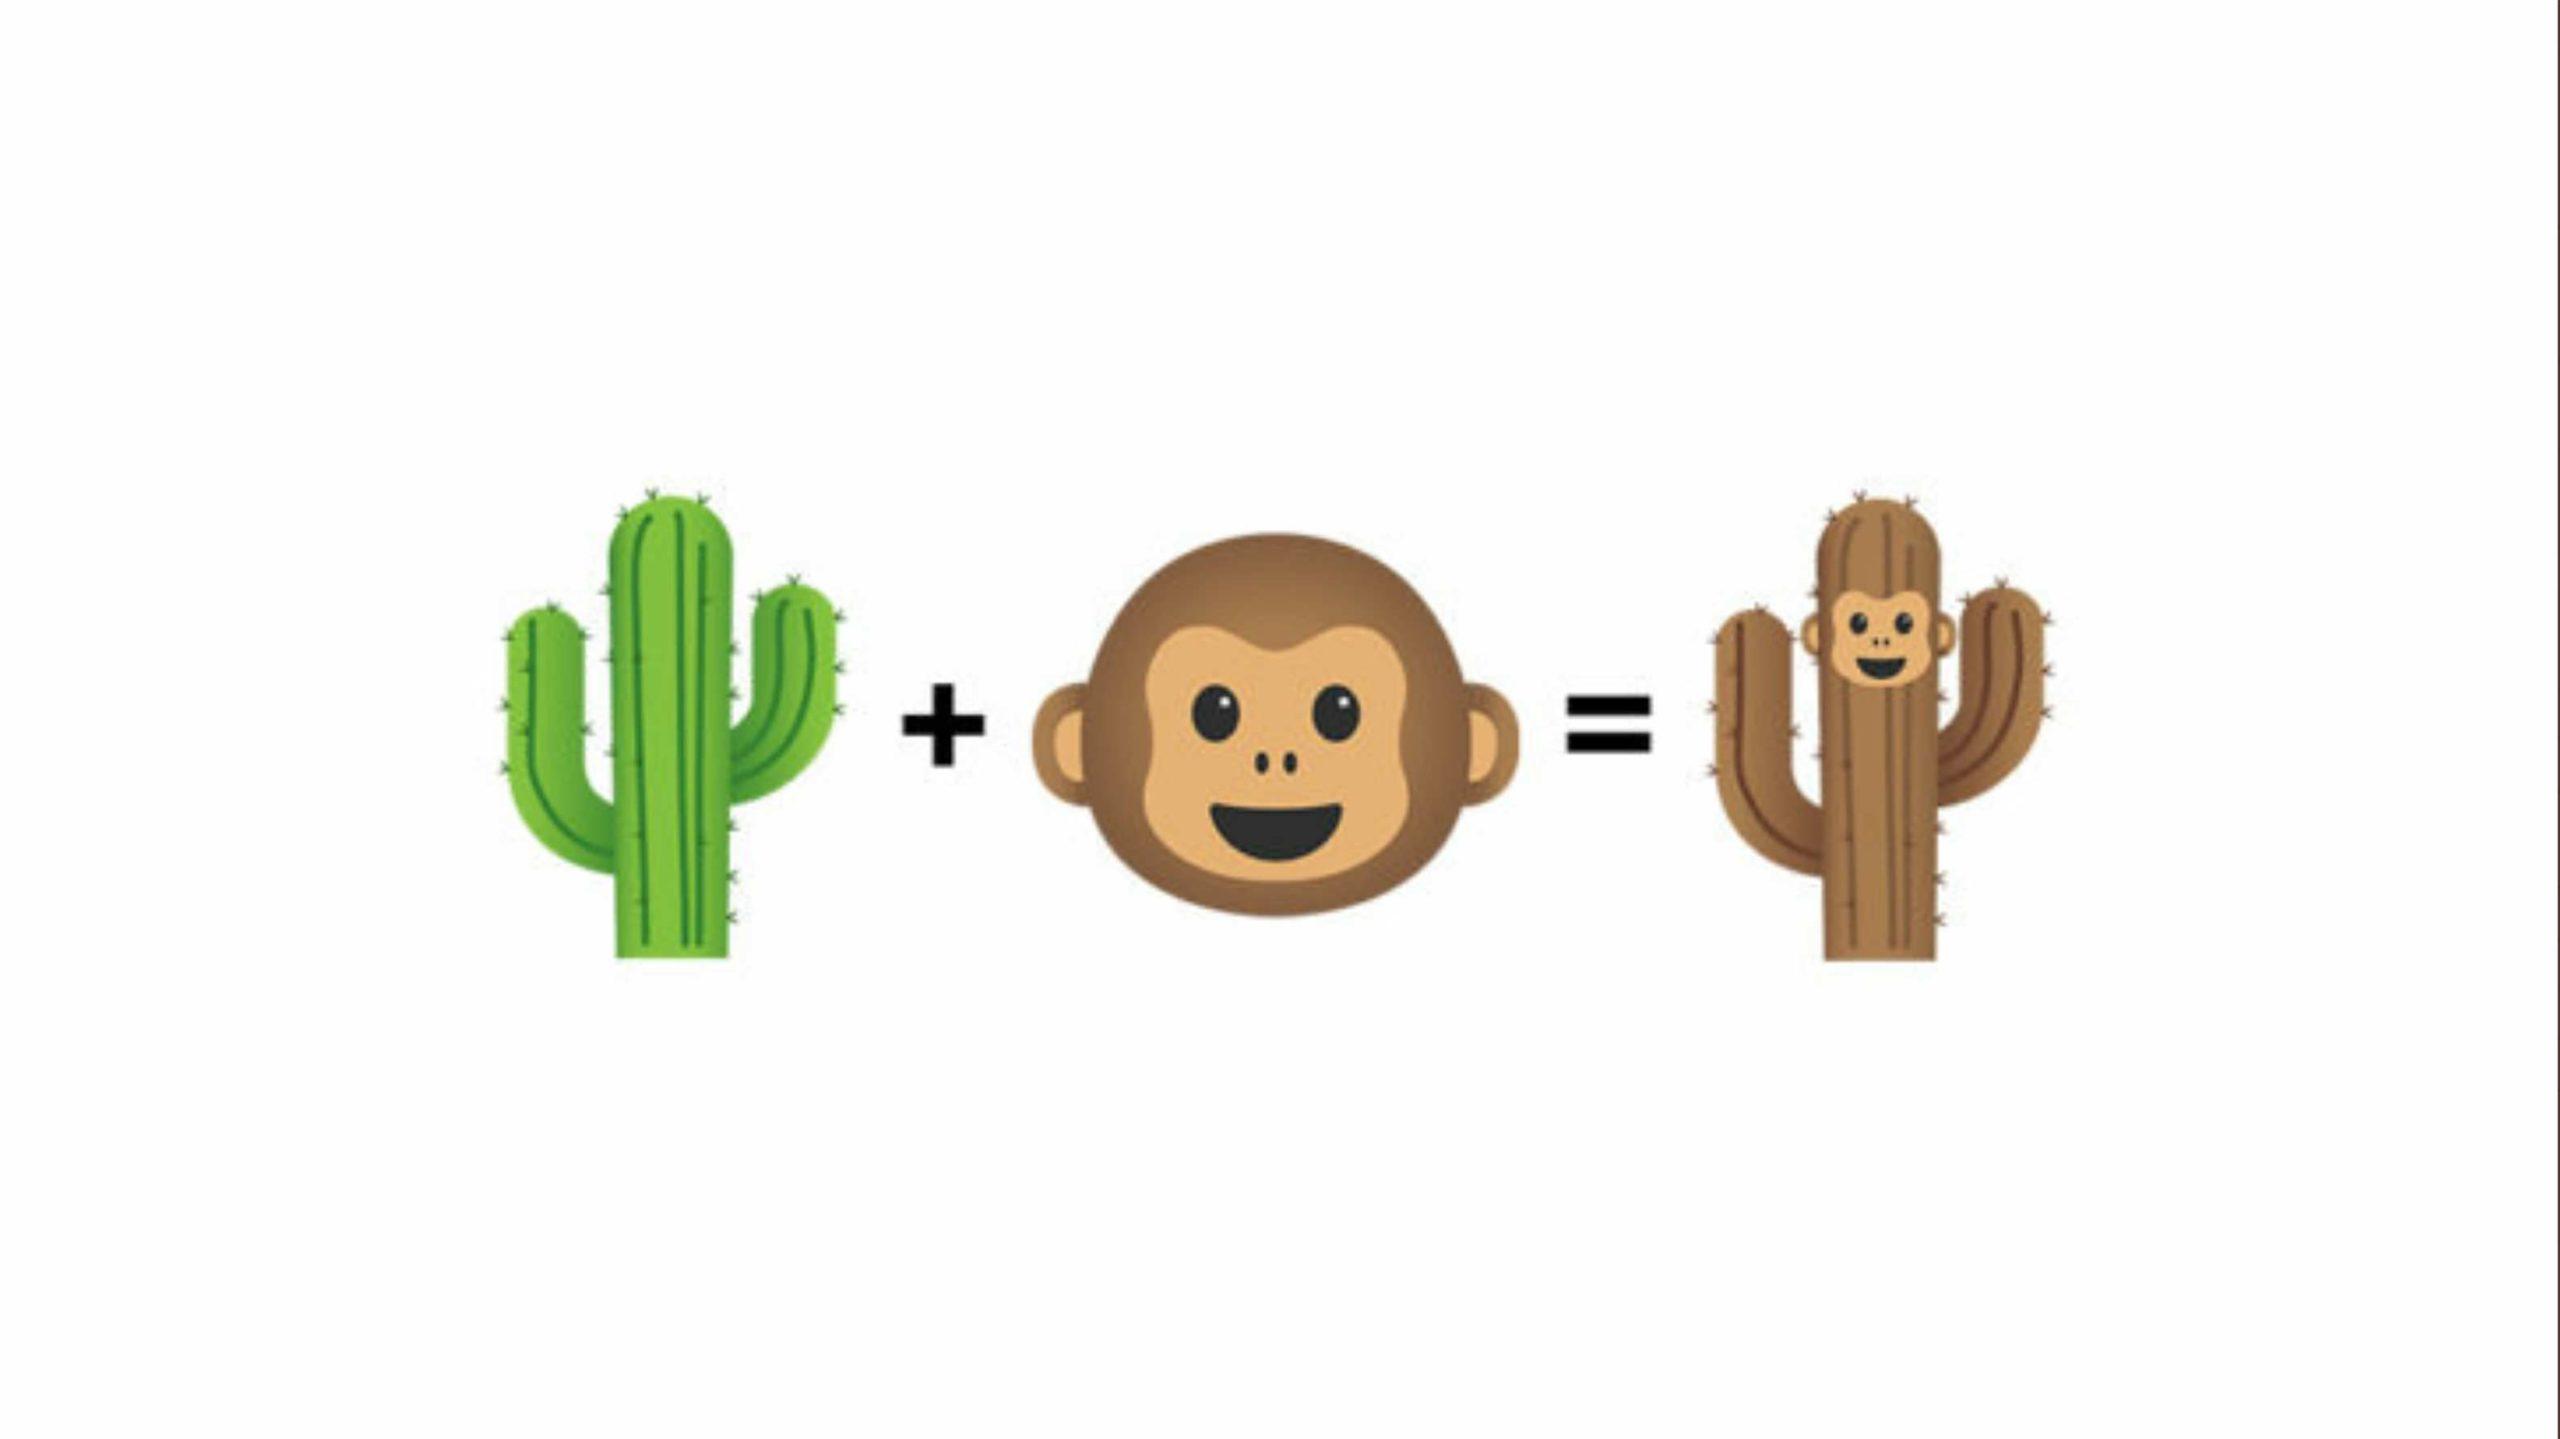 Gboard cactus monkey